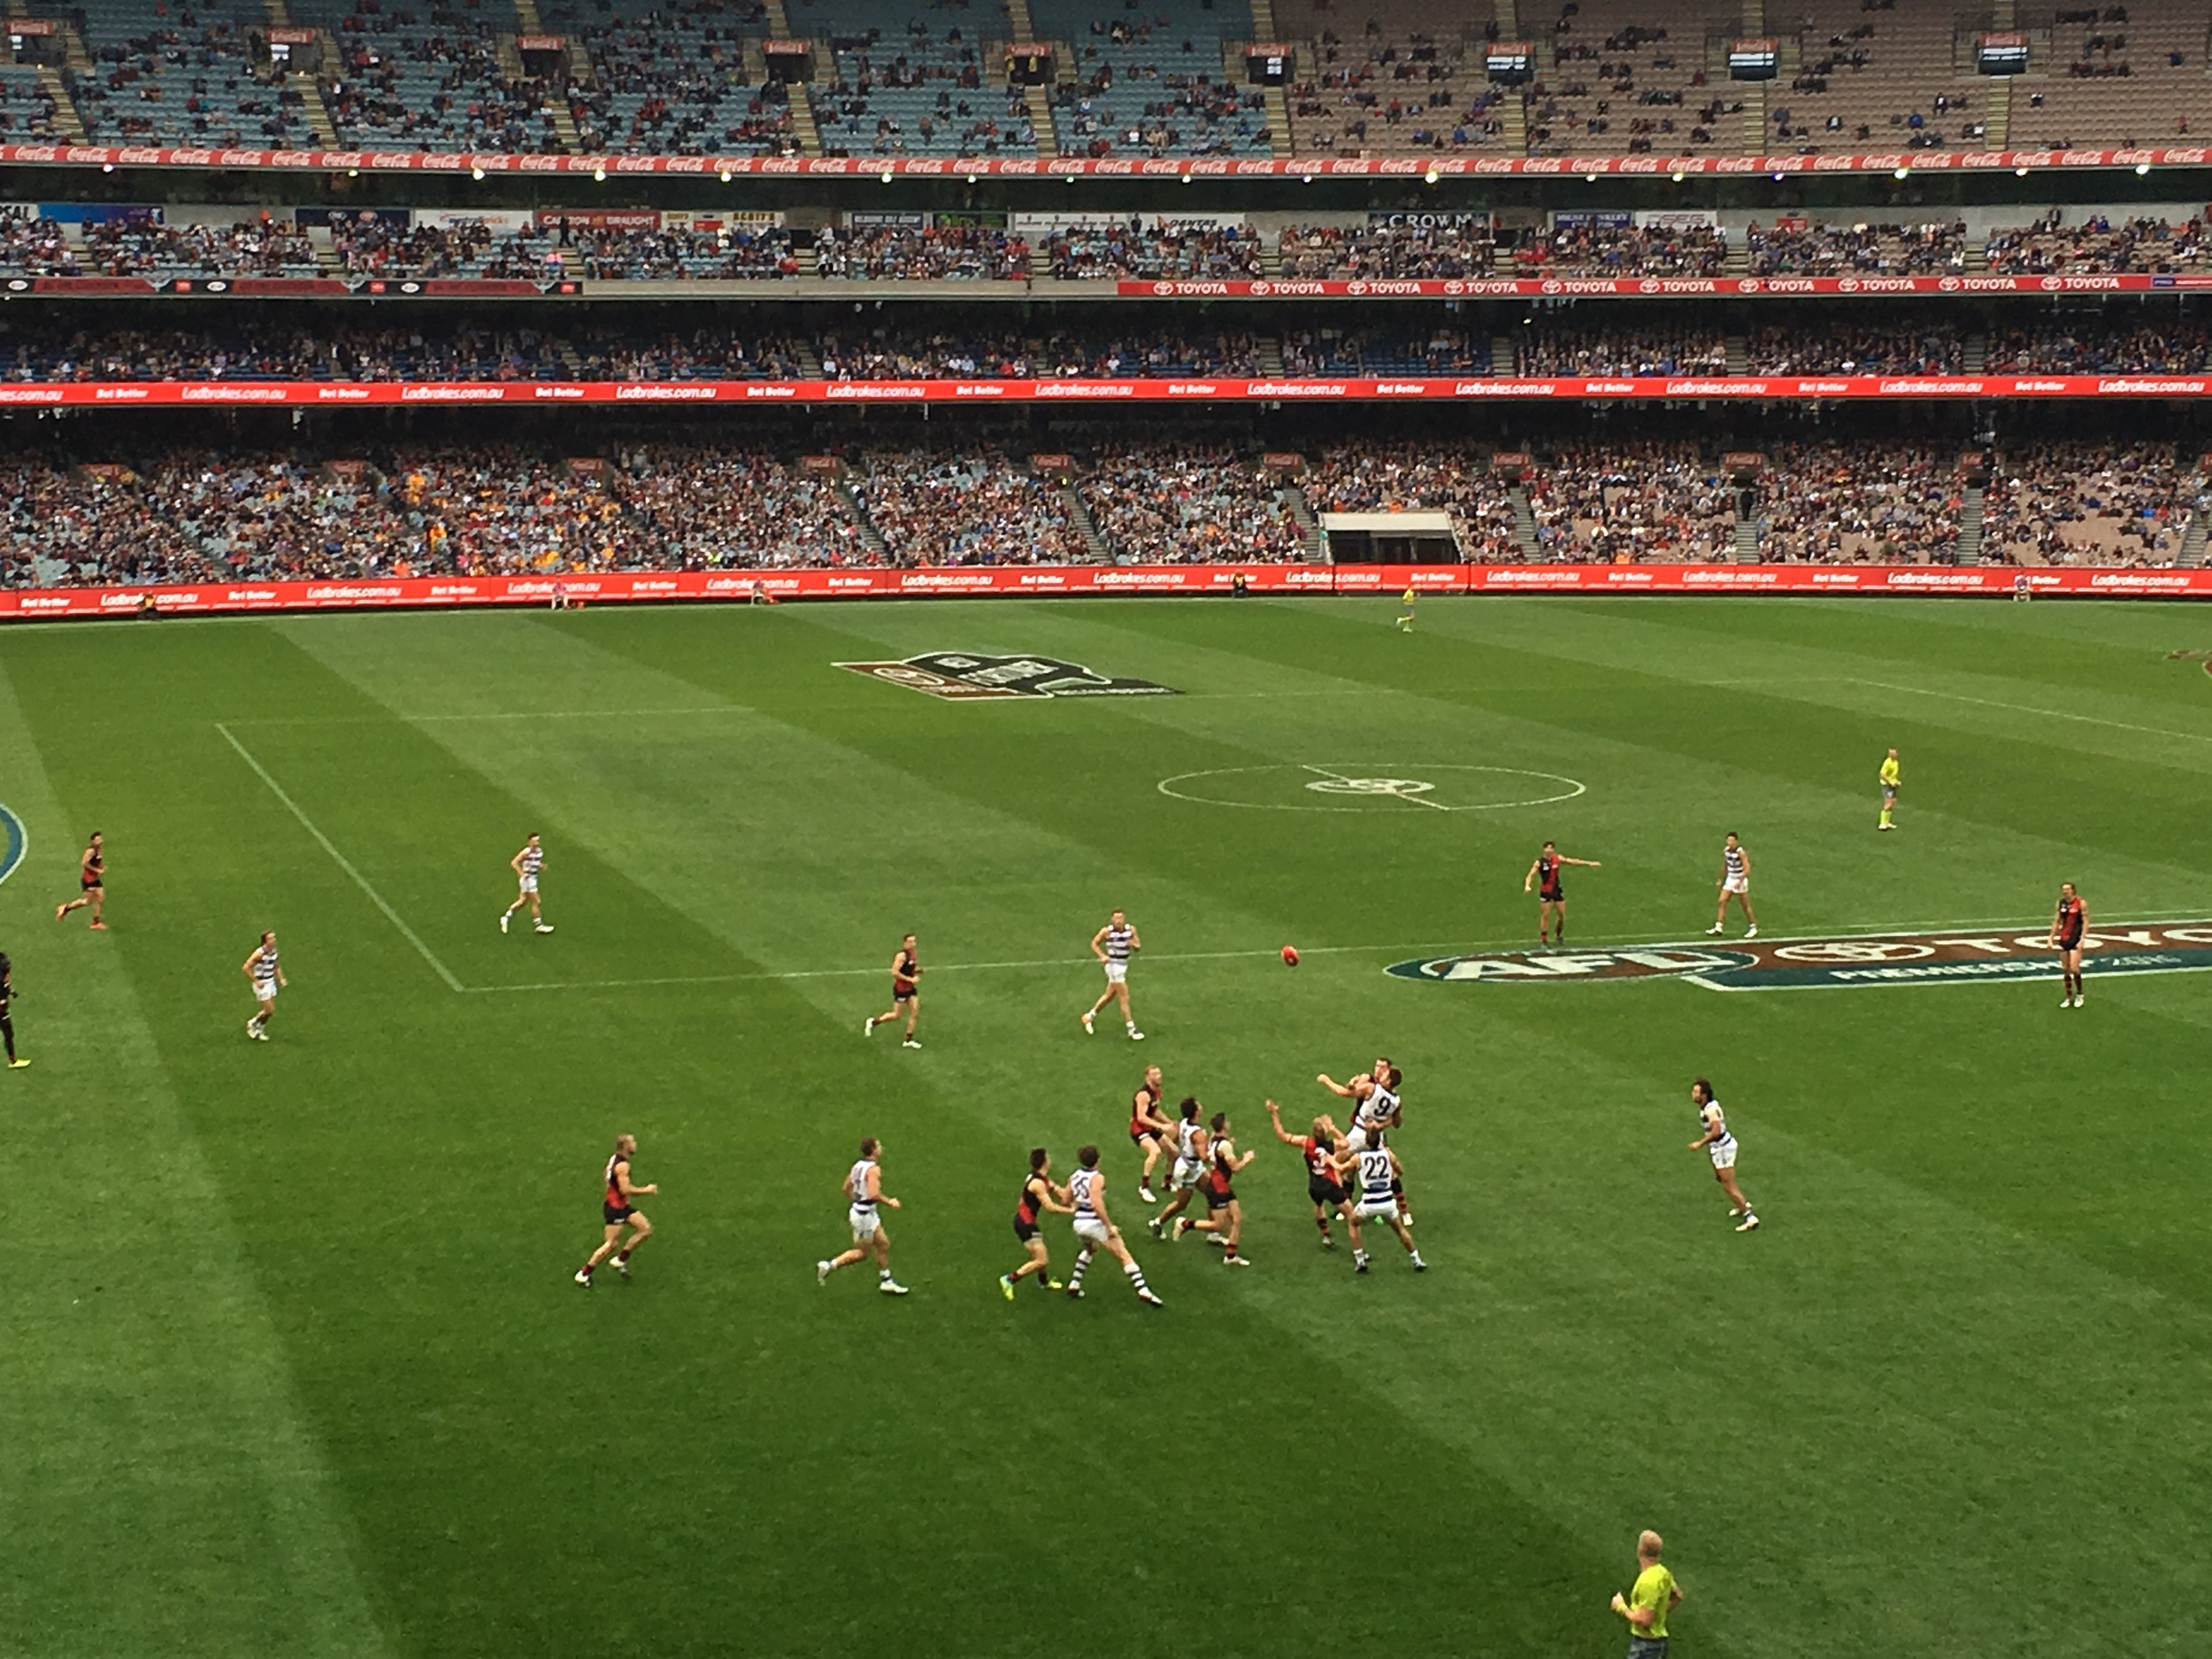 AFL at MCG!!